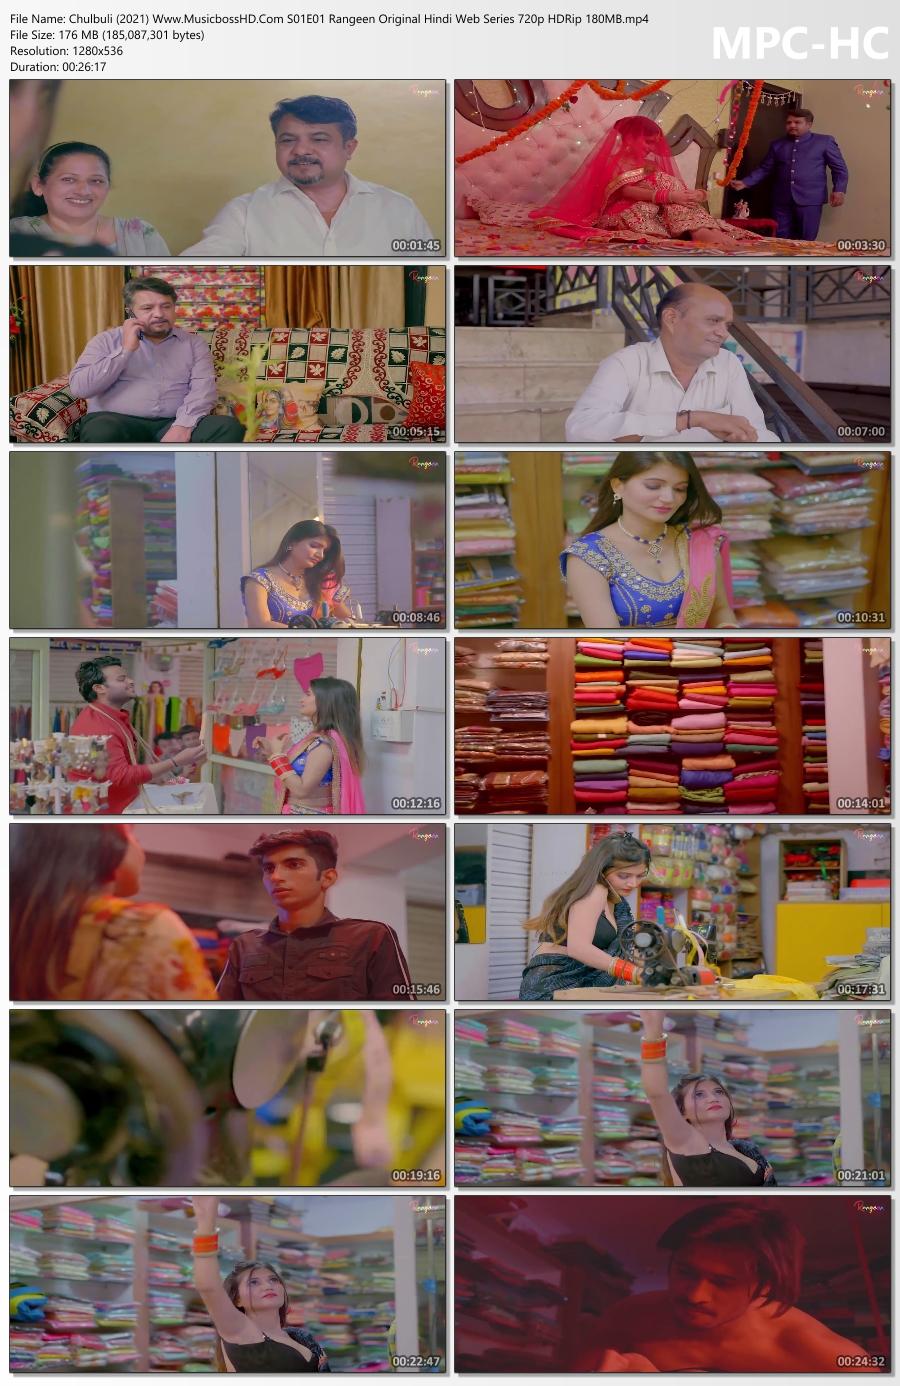 Chulbuli-2021-Www-Musicboss-HD-Com-S01-E01-Rangeen-Original-Hindi-Web-Series-720p-HDRip-180-MB-mp4-t